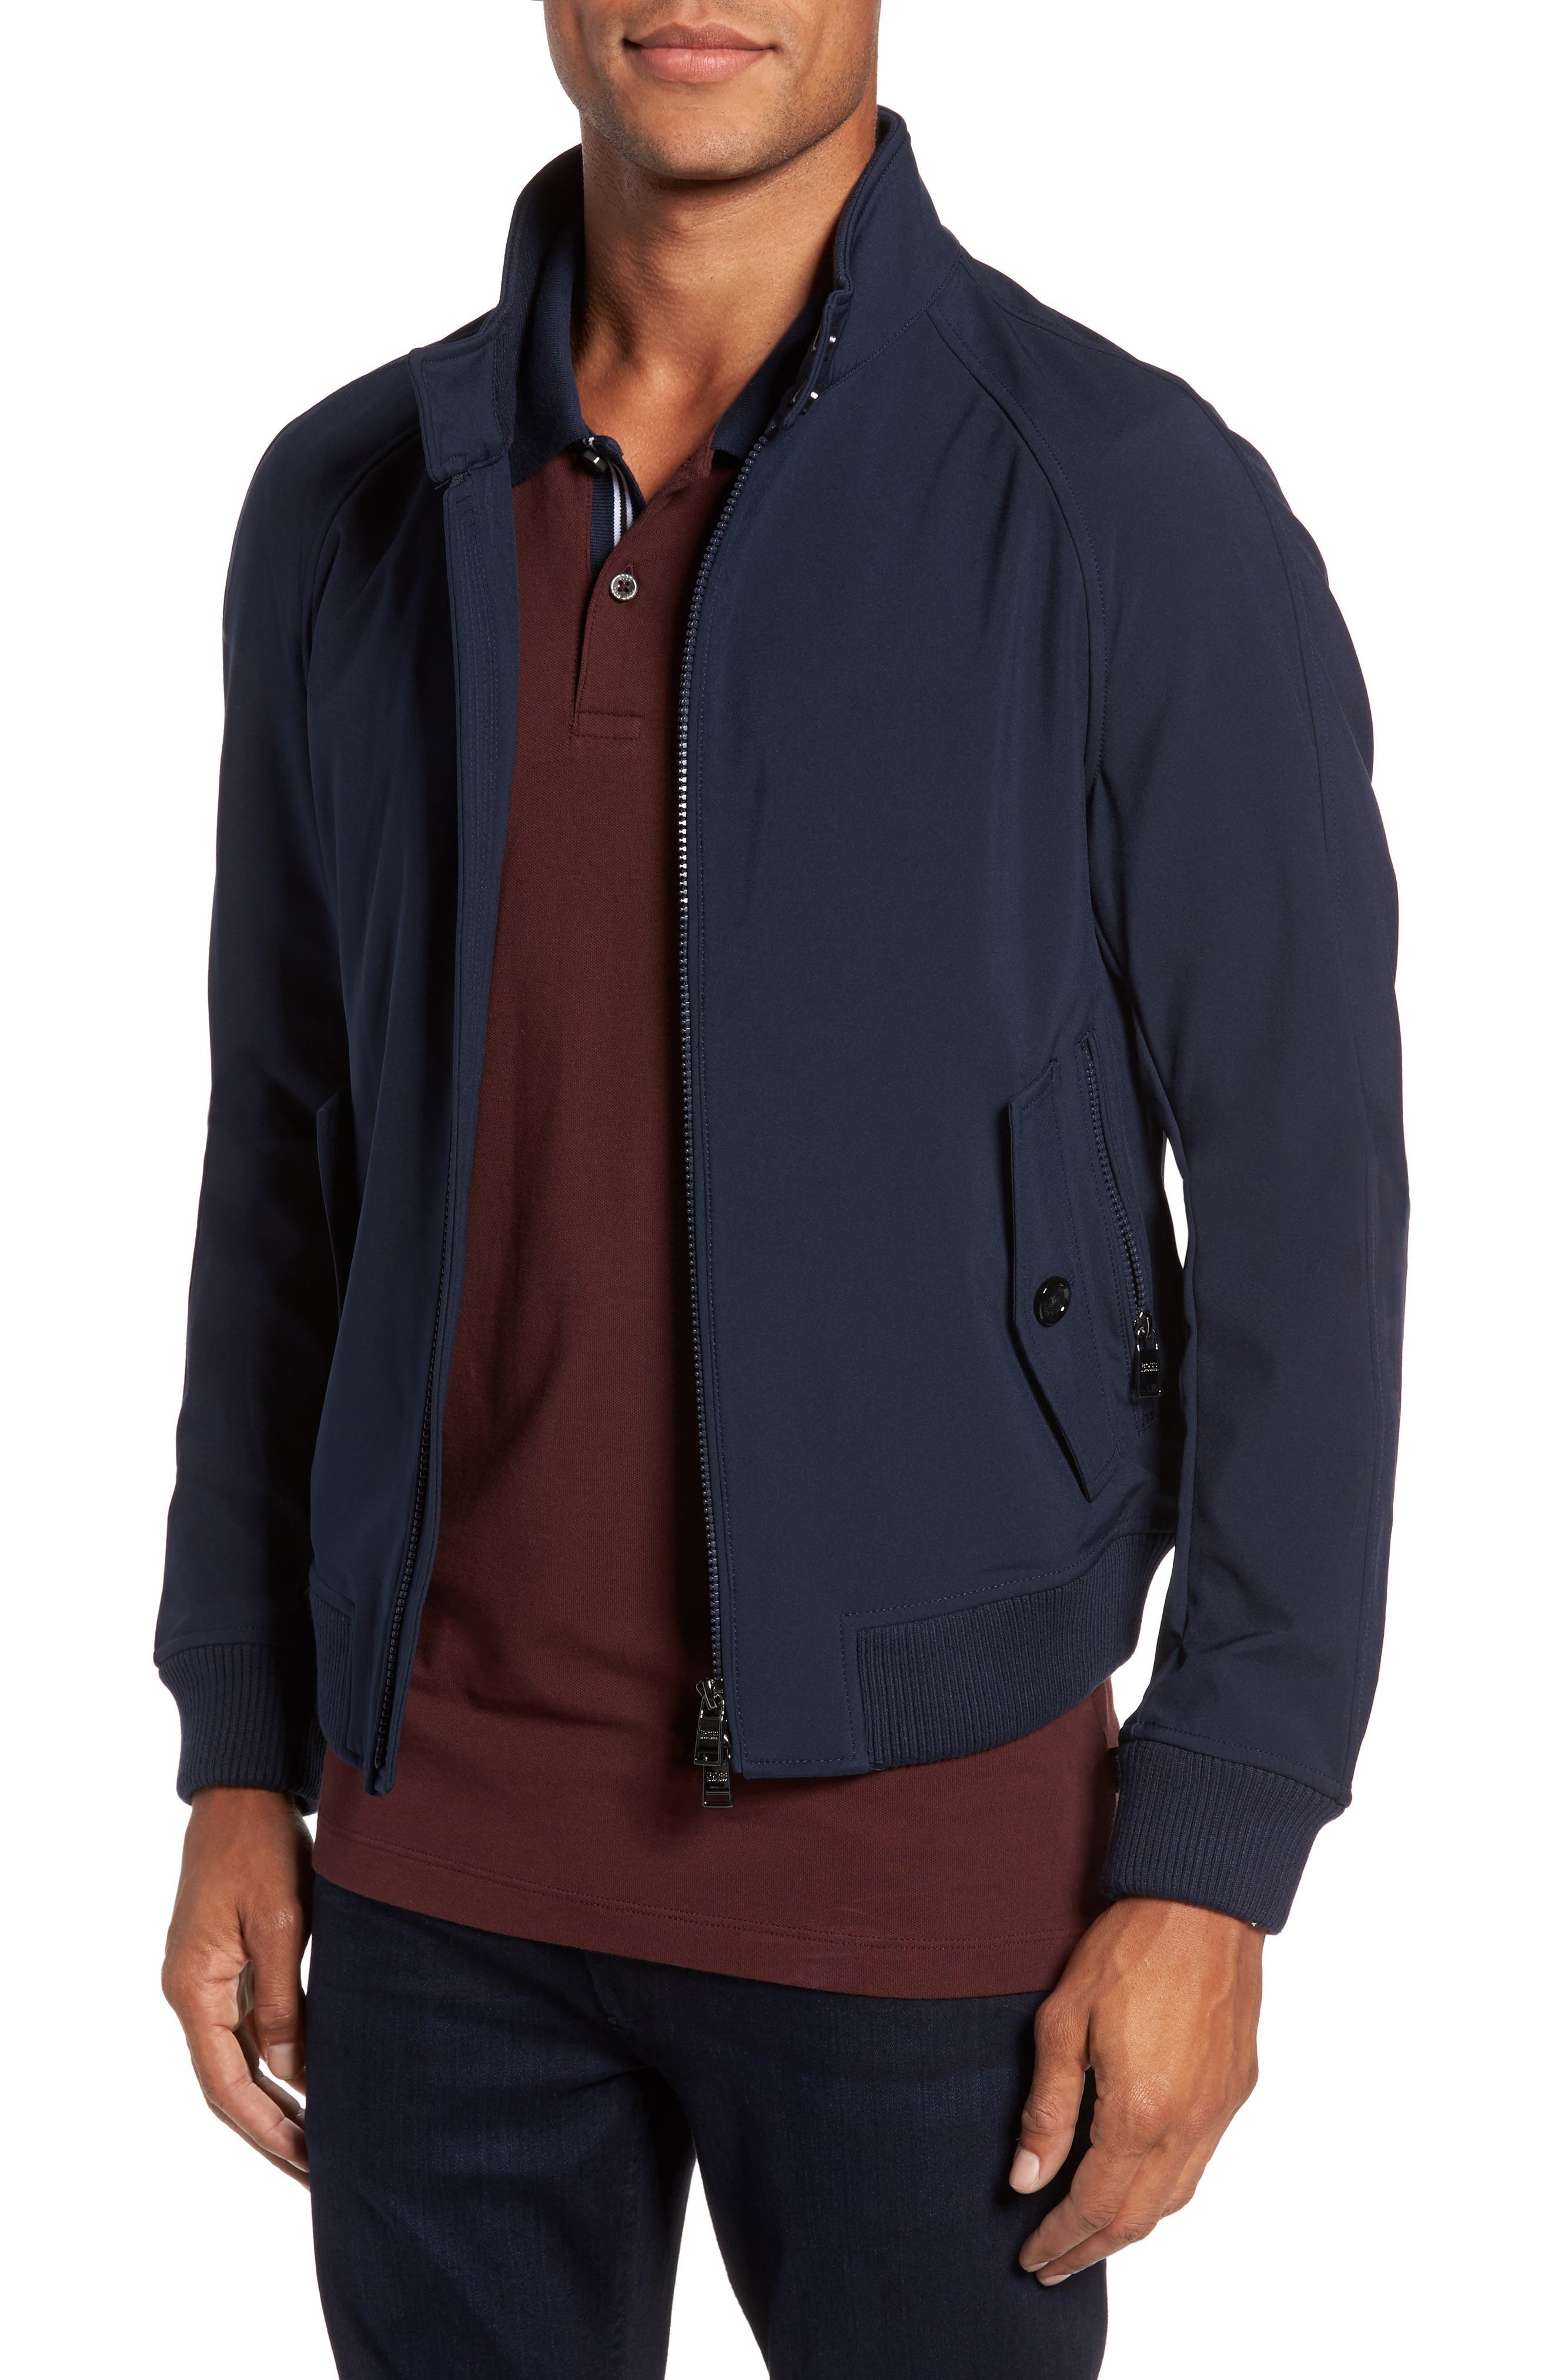 Corva Technical Jacket,                             Main thumbnail 1, color,                             Navy